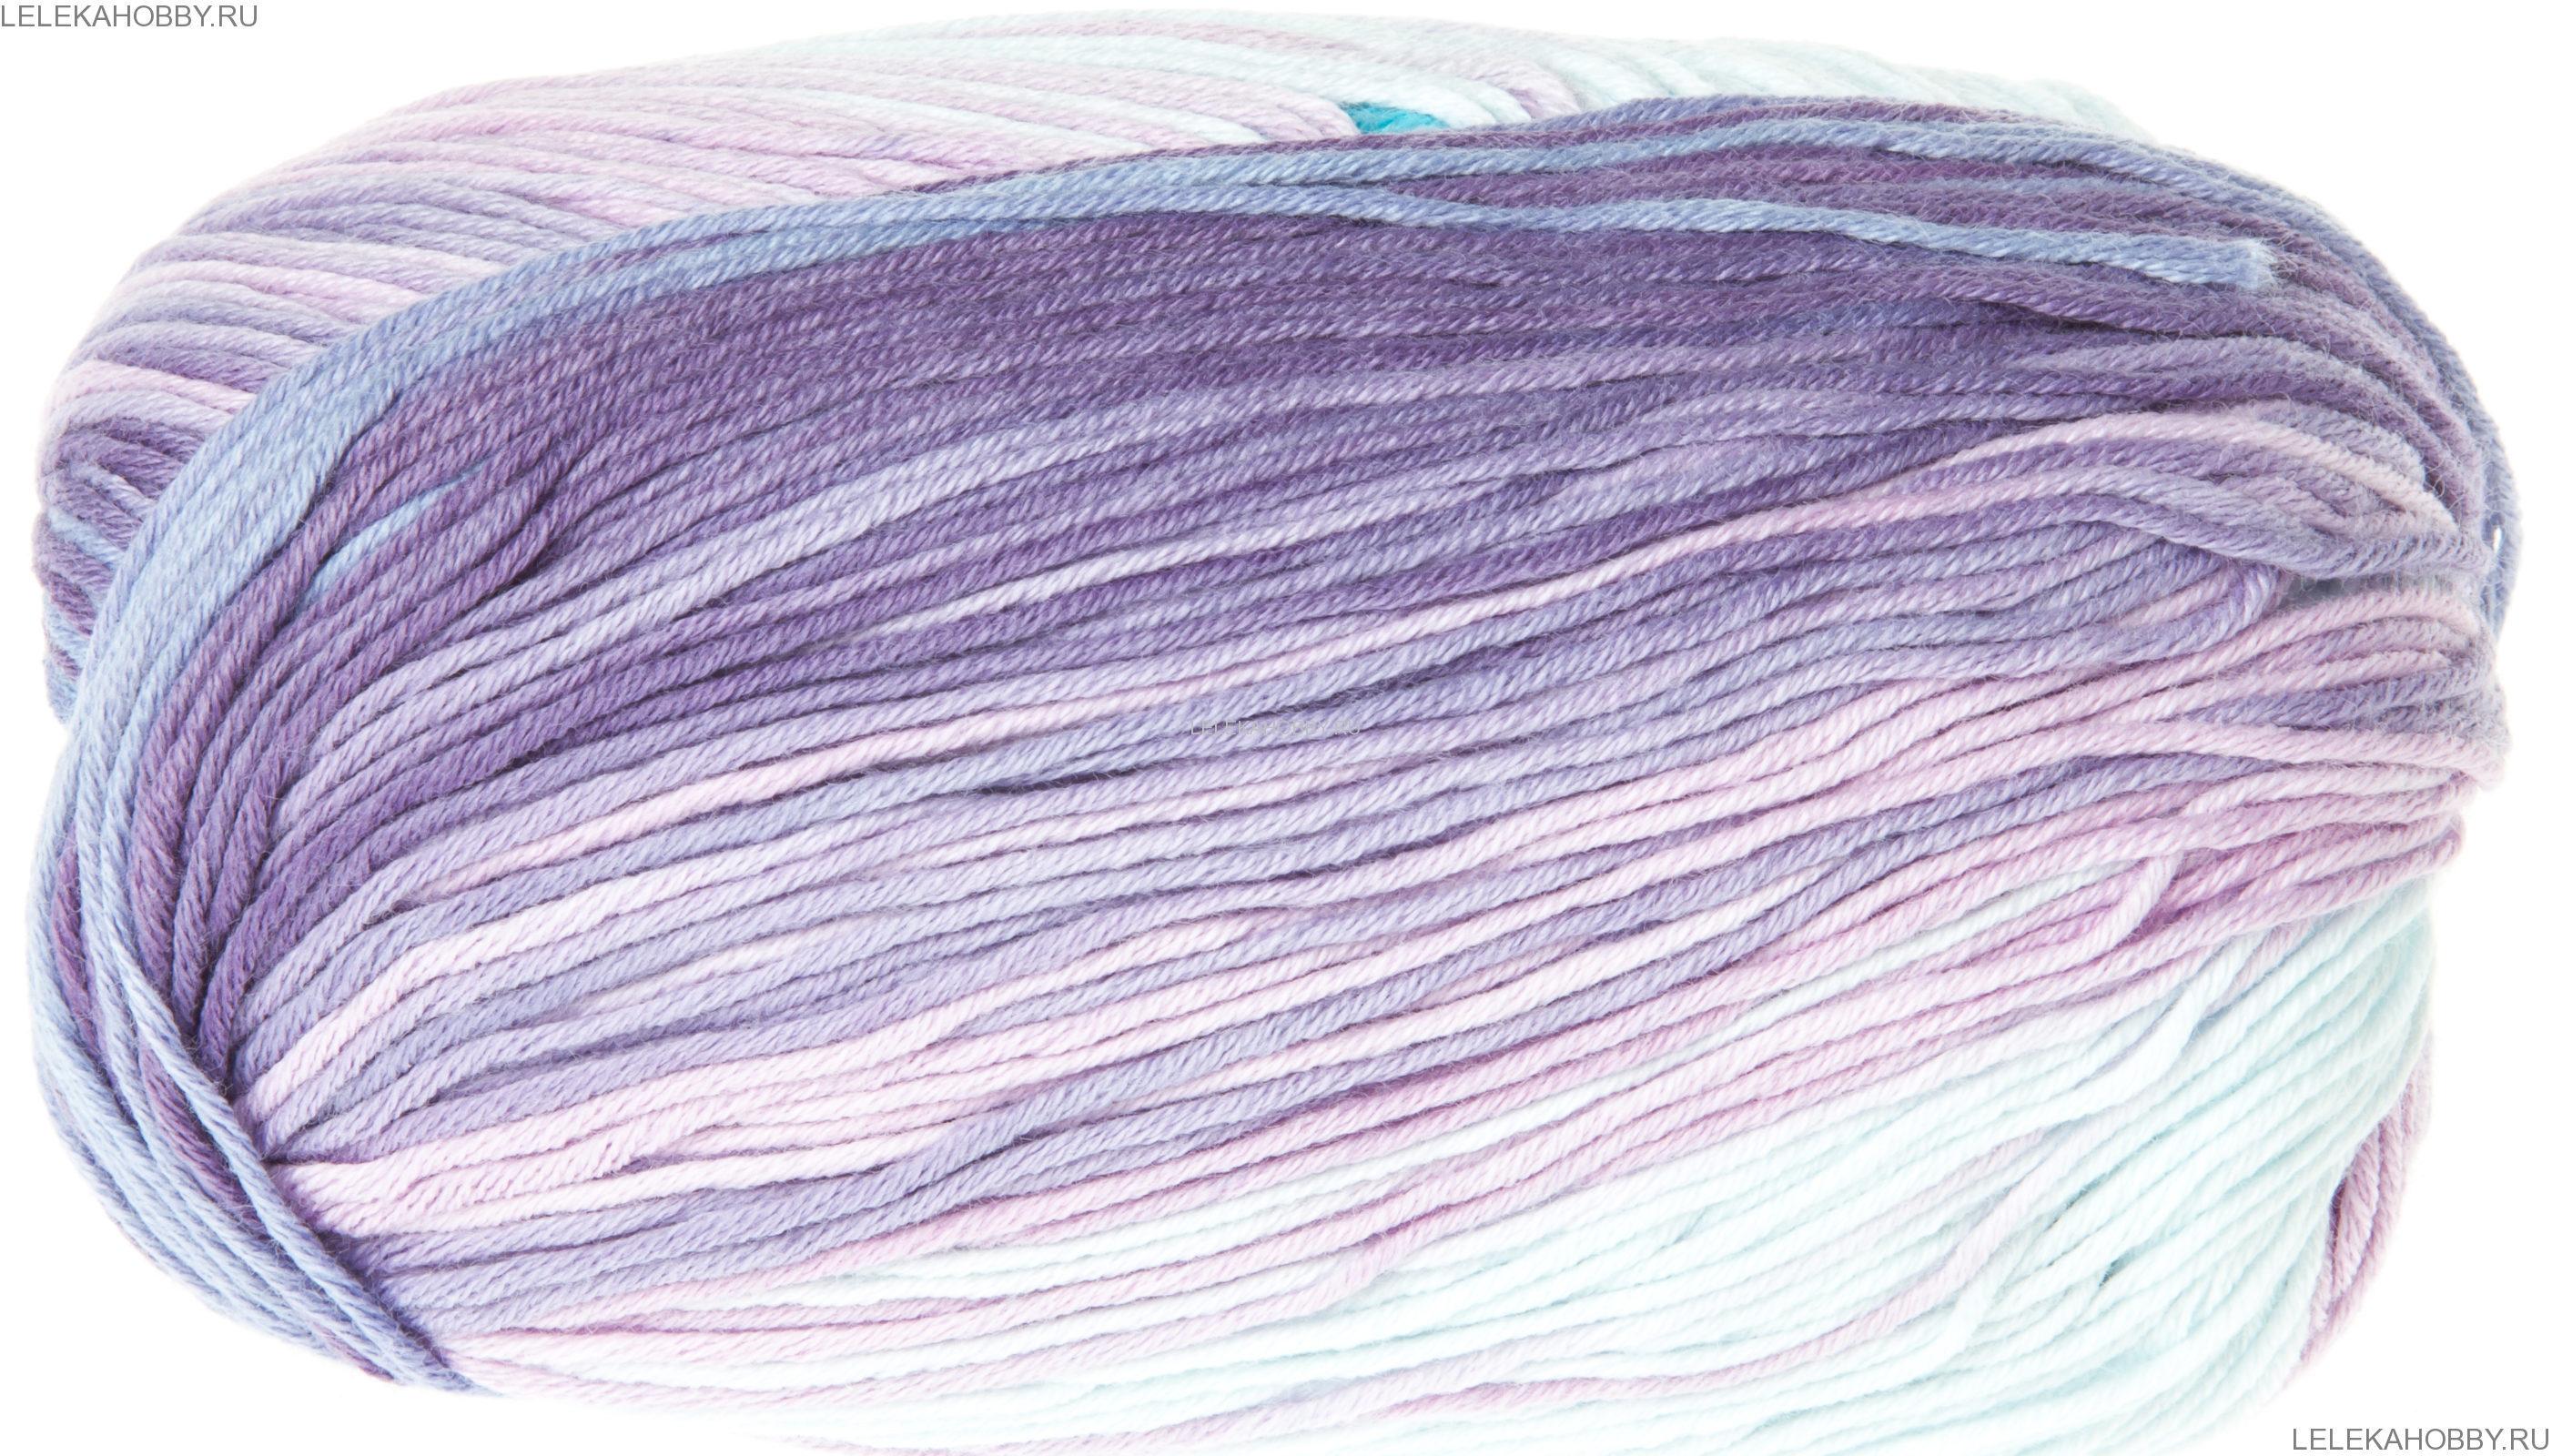 Нитки для вязания мочалок в спб